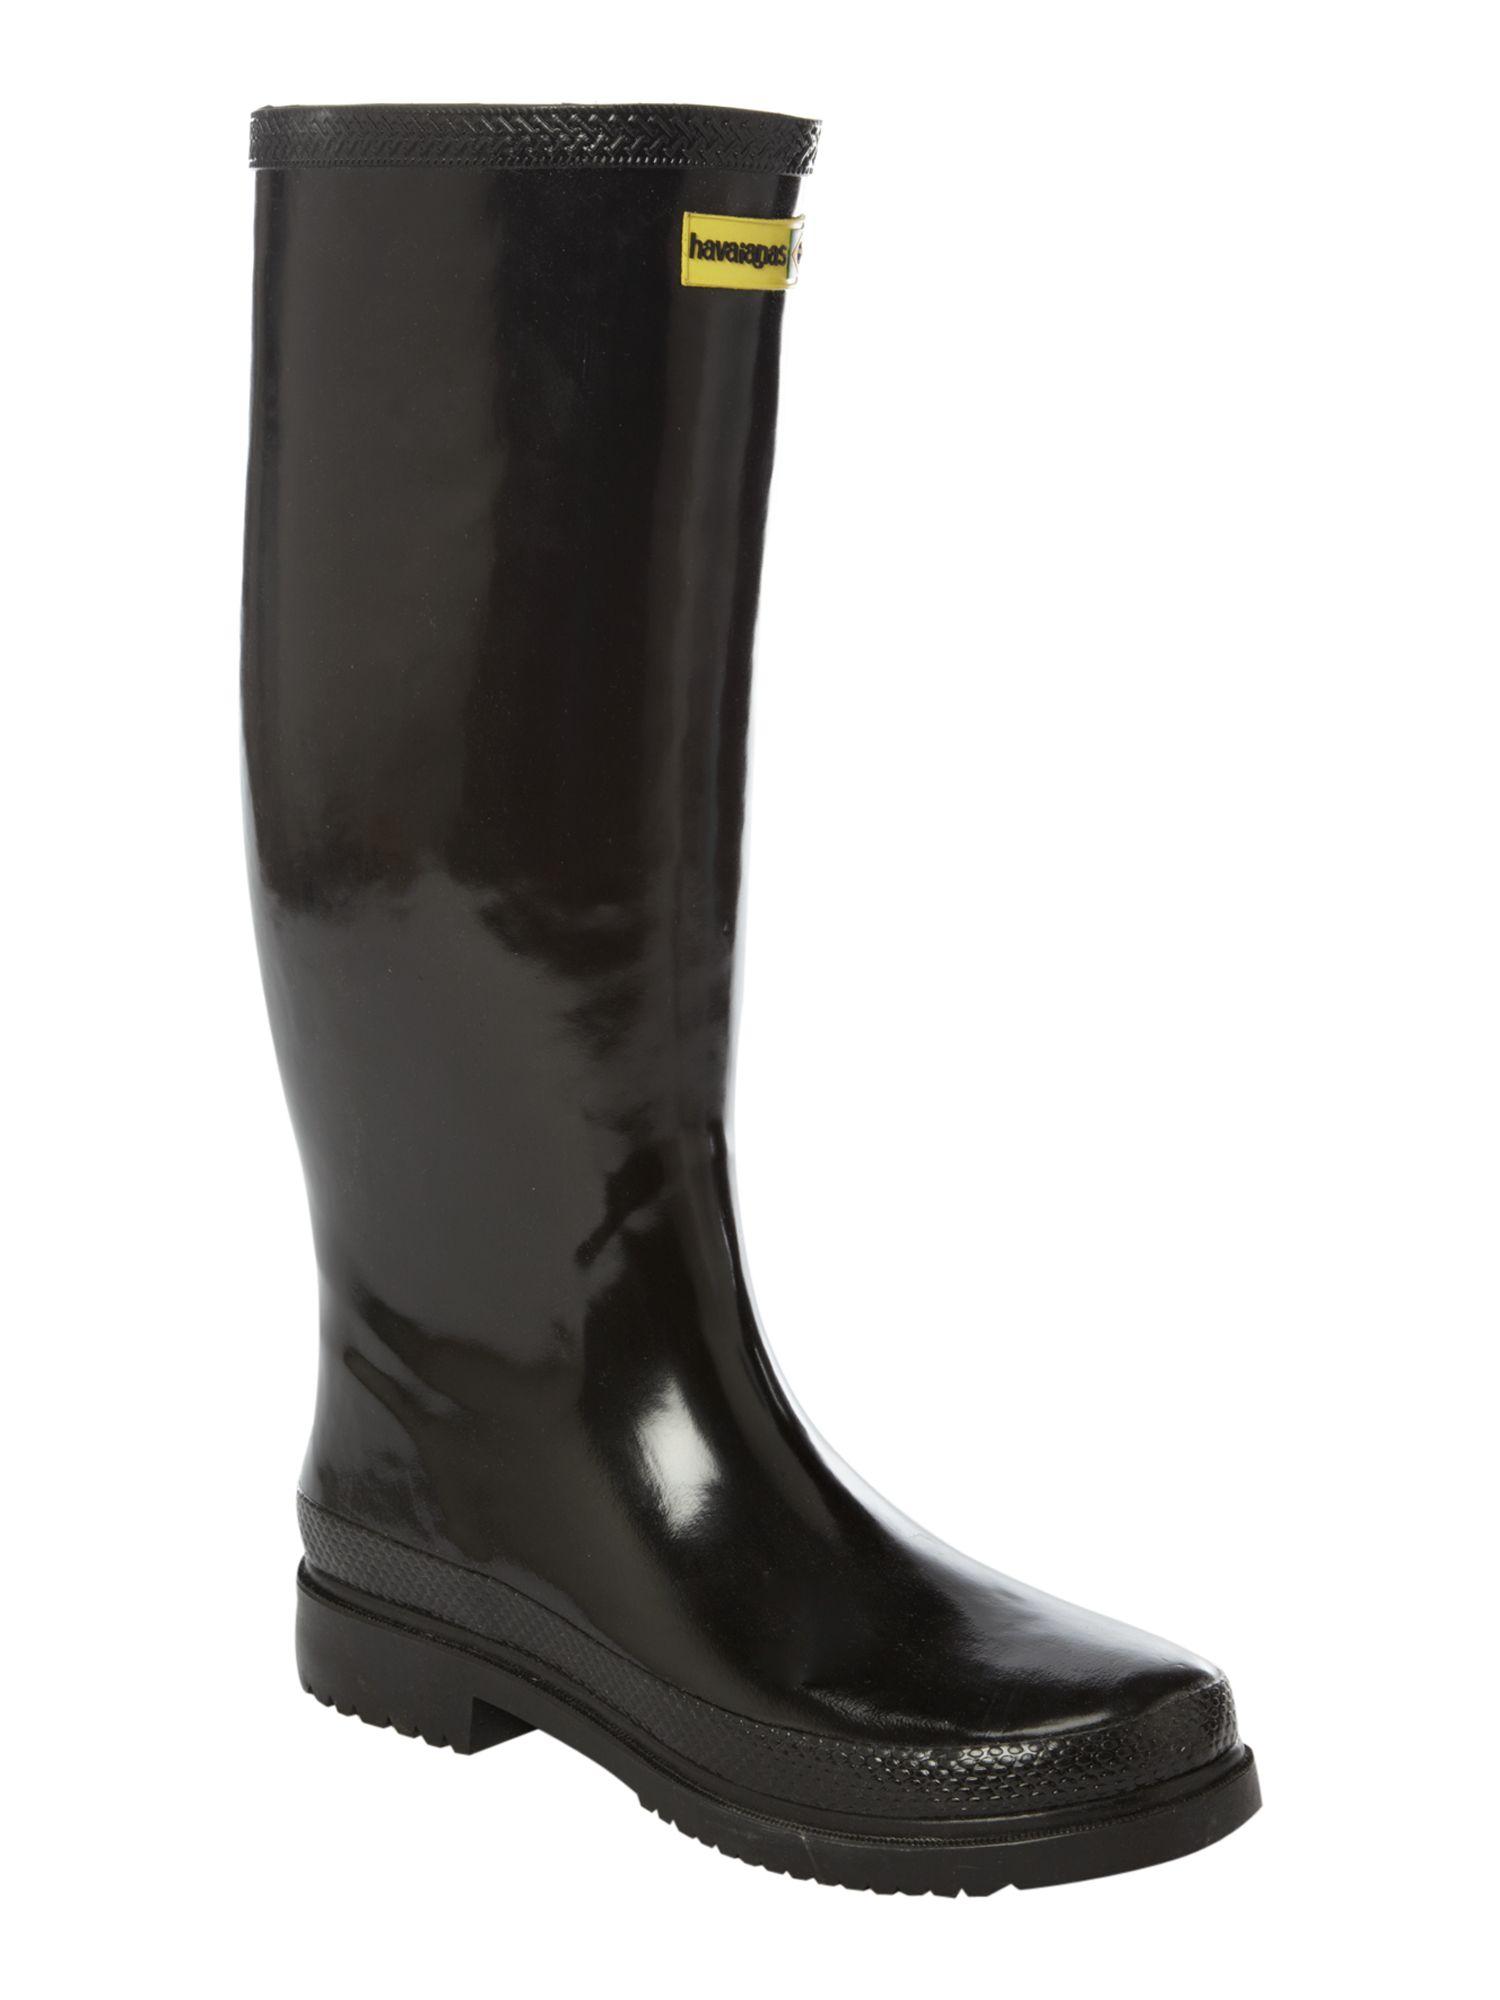 Havaianas Rain Boots In Black For Men Lyst